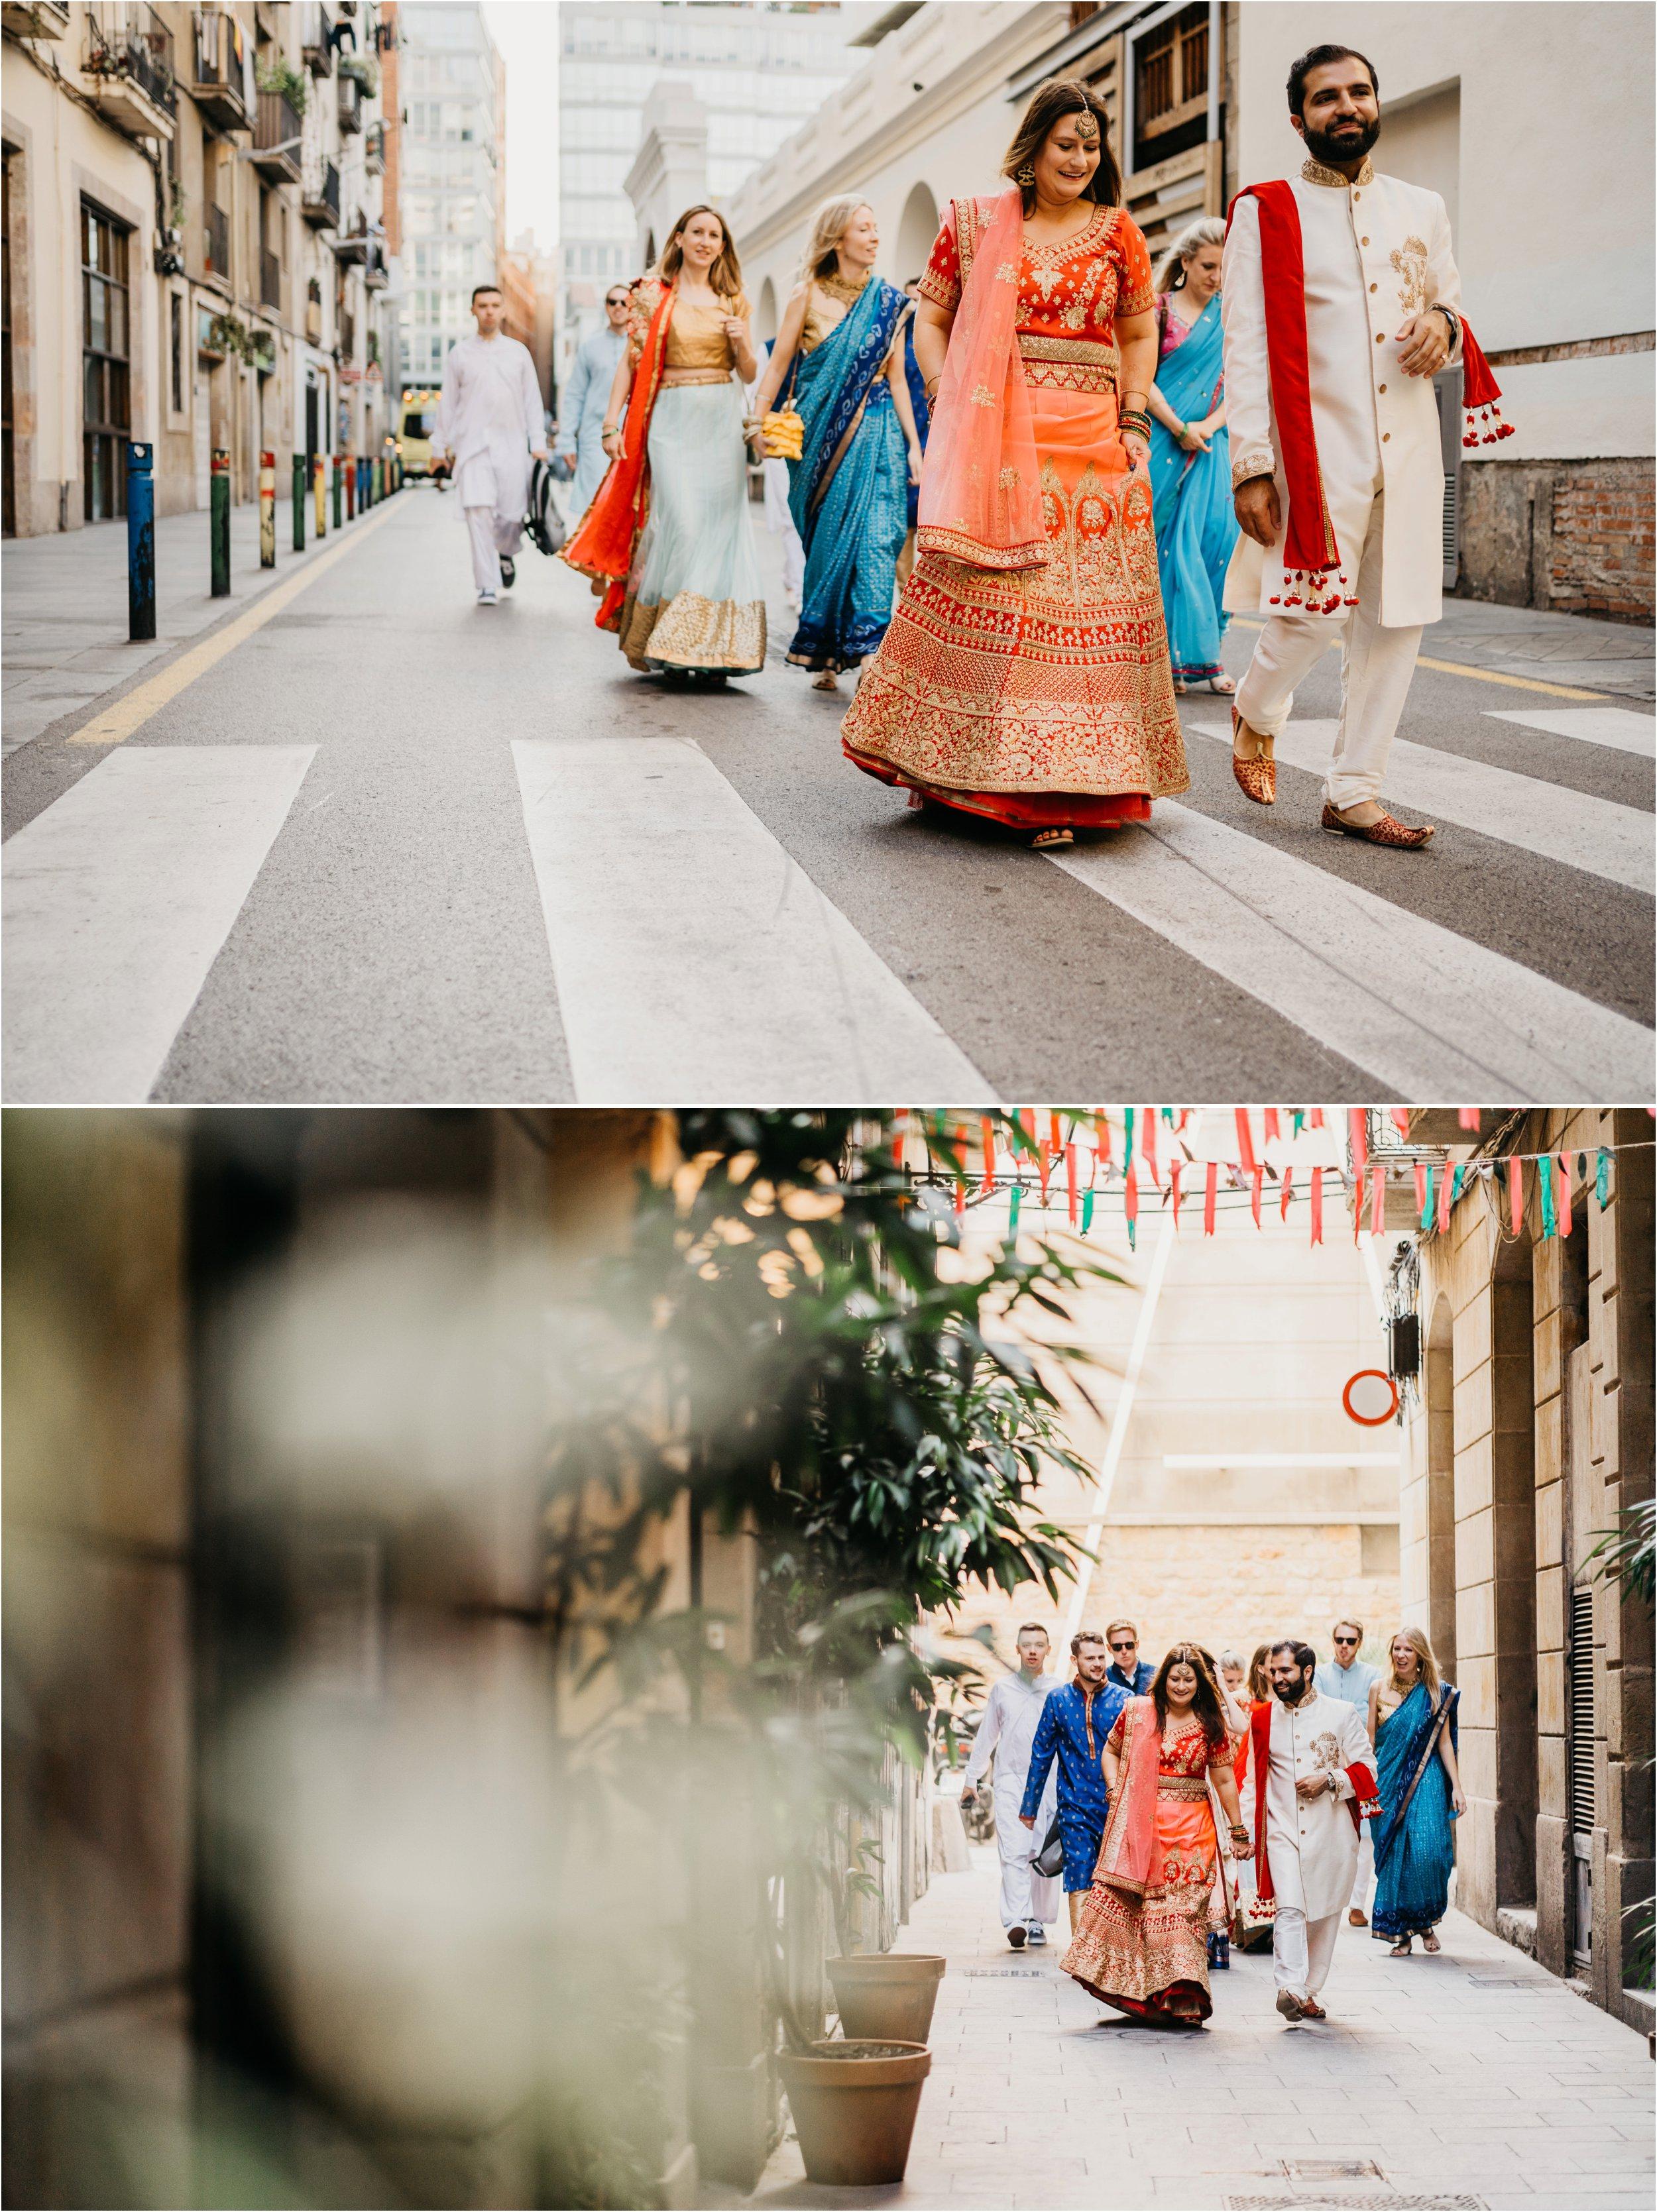 Barcelona Spain destination wedding photographer_0015.jpg